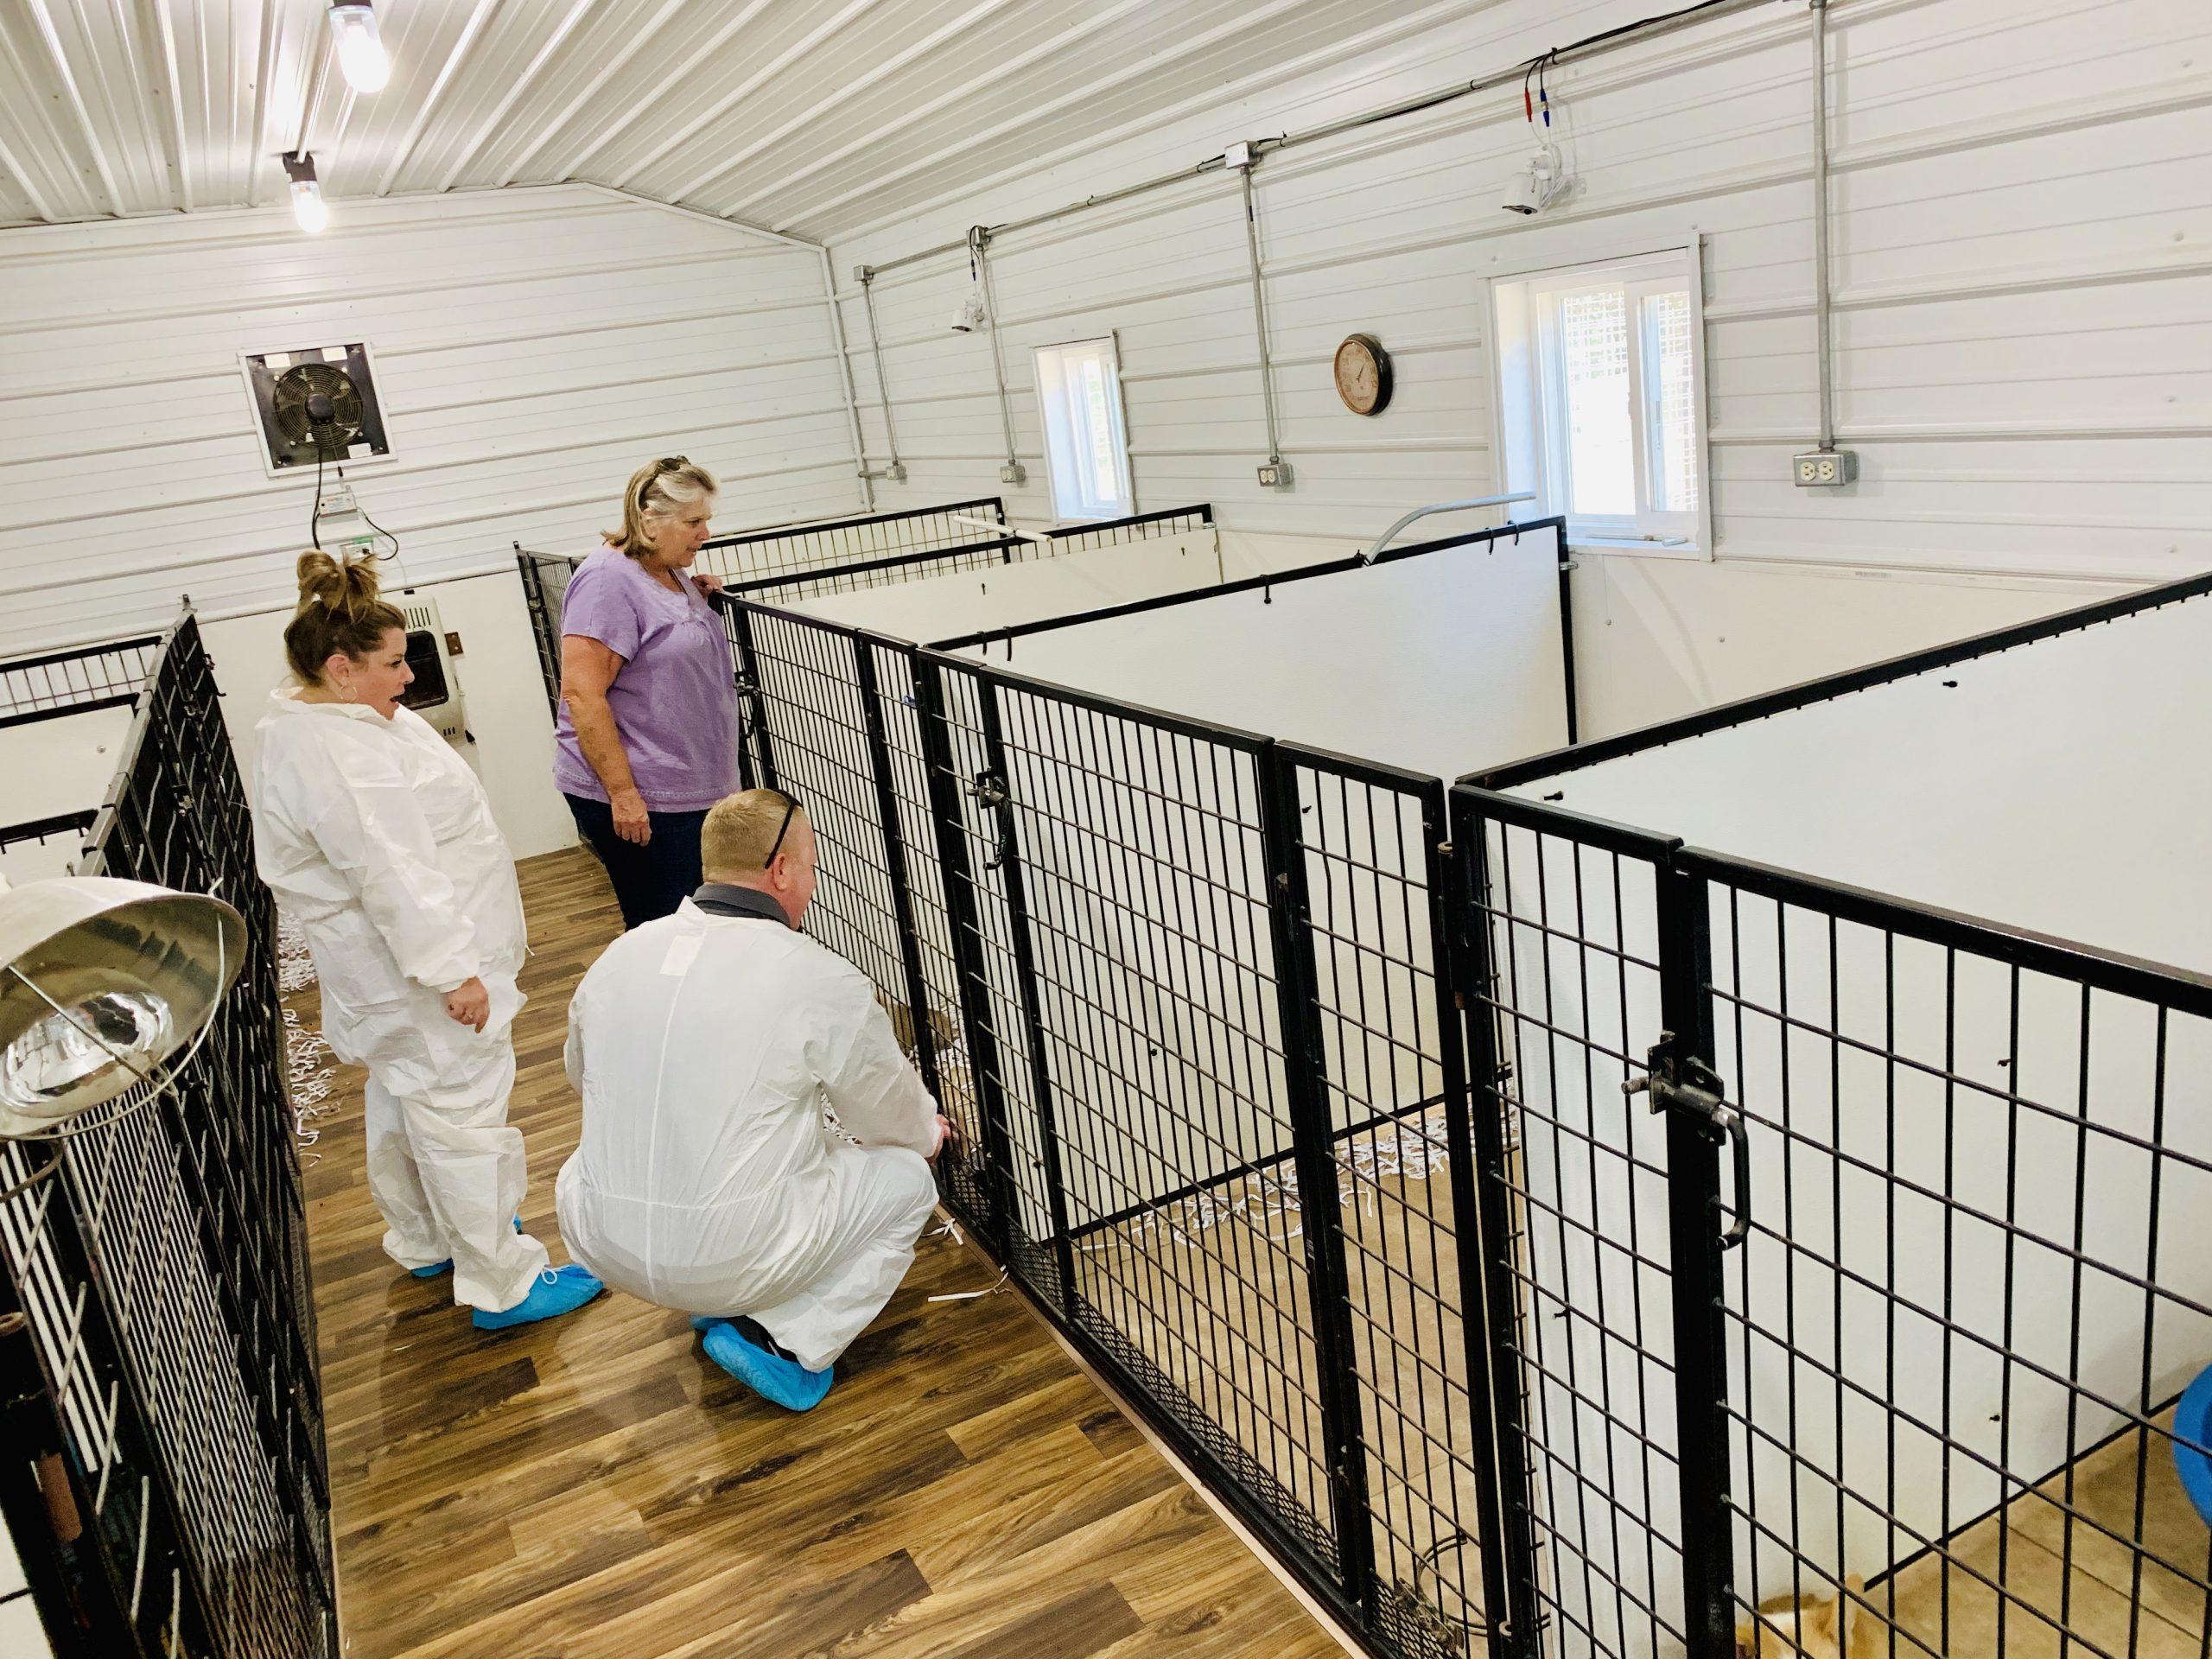 Frank Mineo Jr inspecting Nancy's kennel